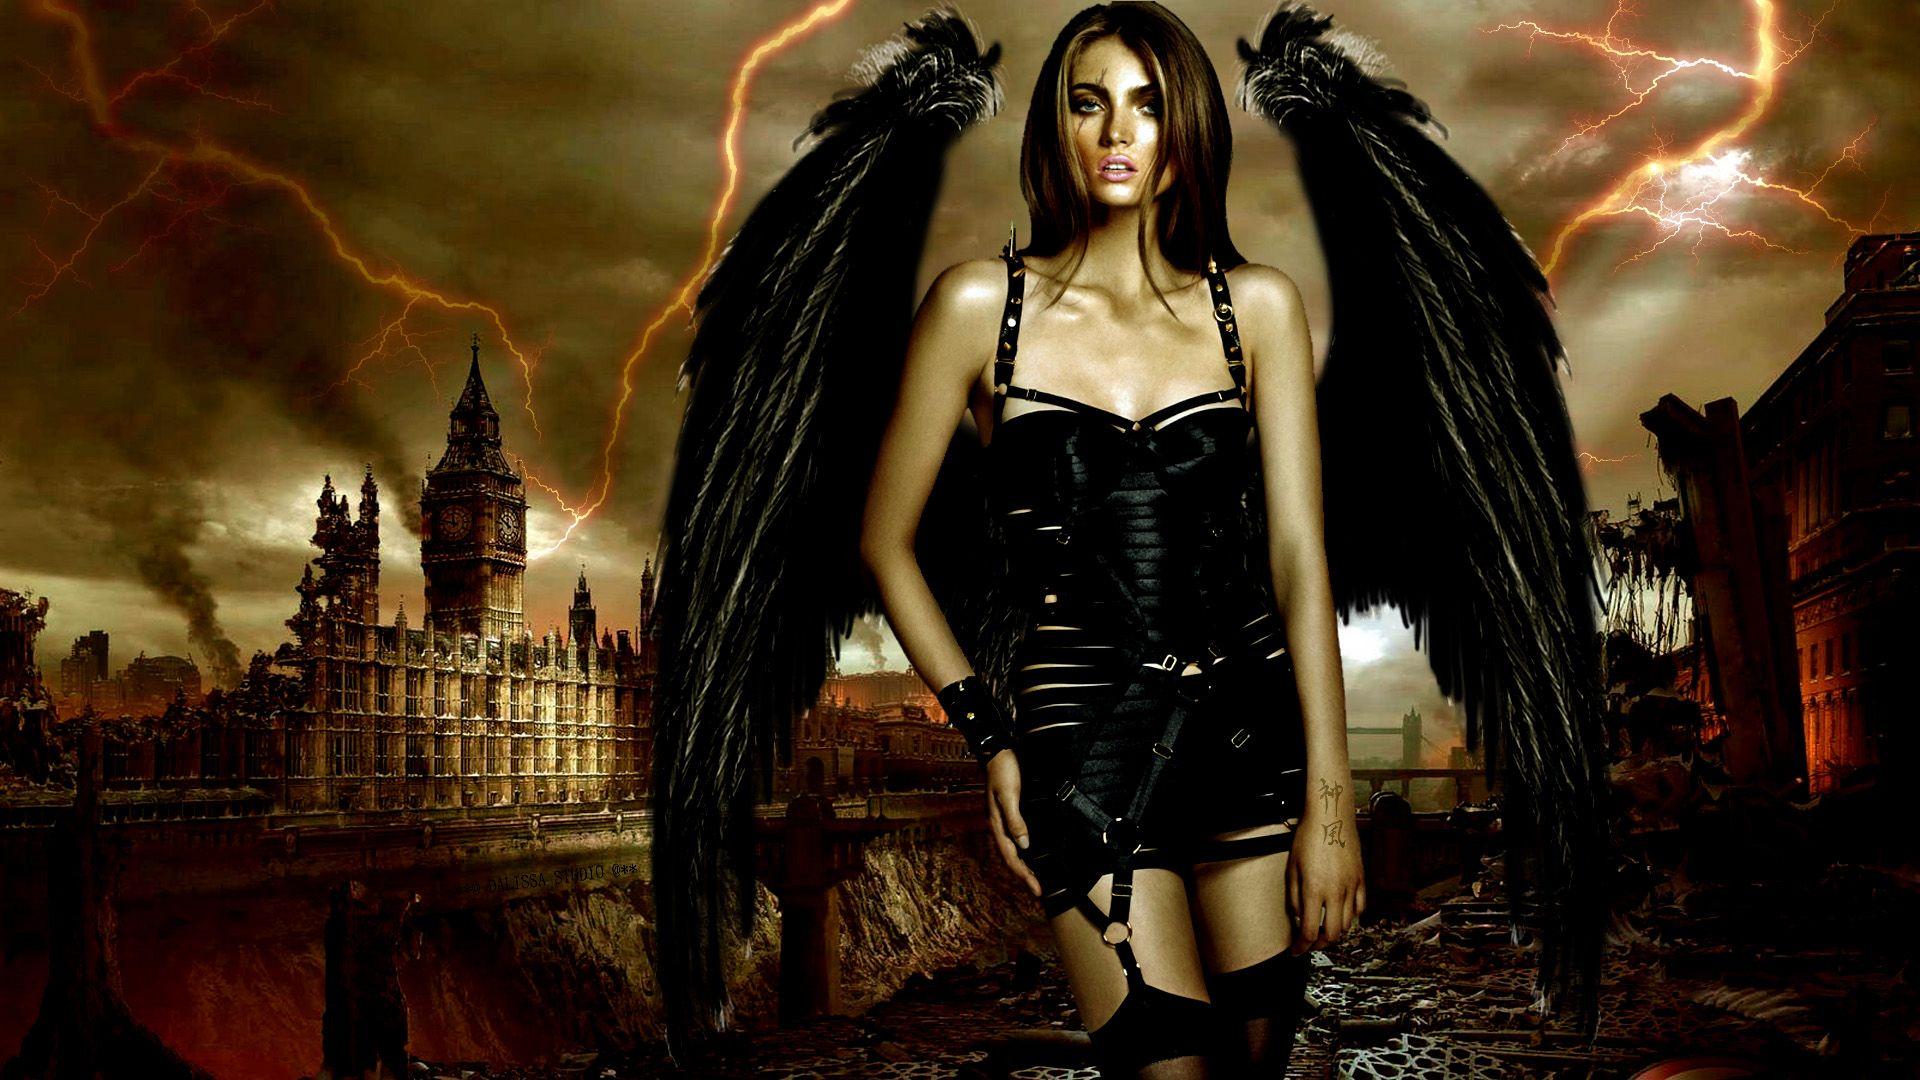 Sexy fallen angel wallpaper